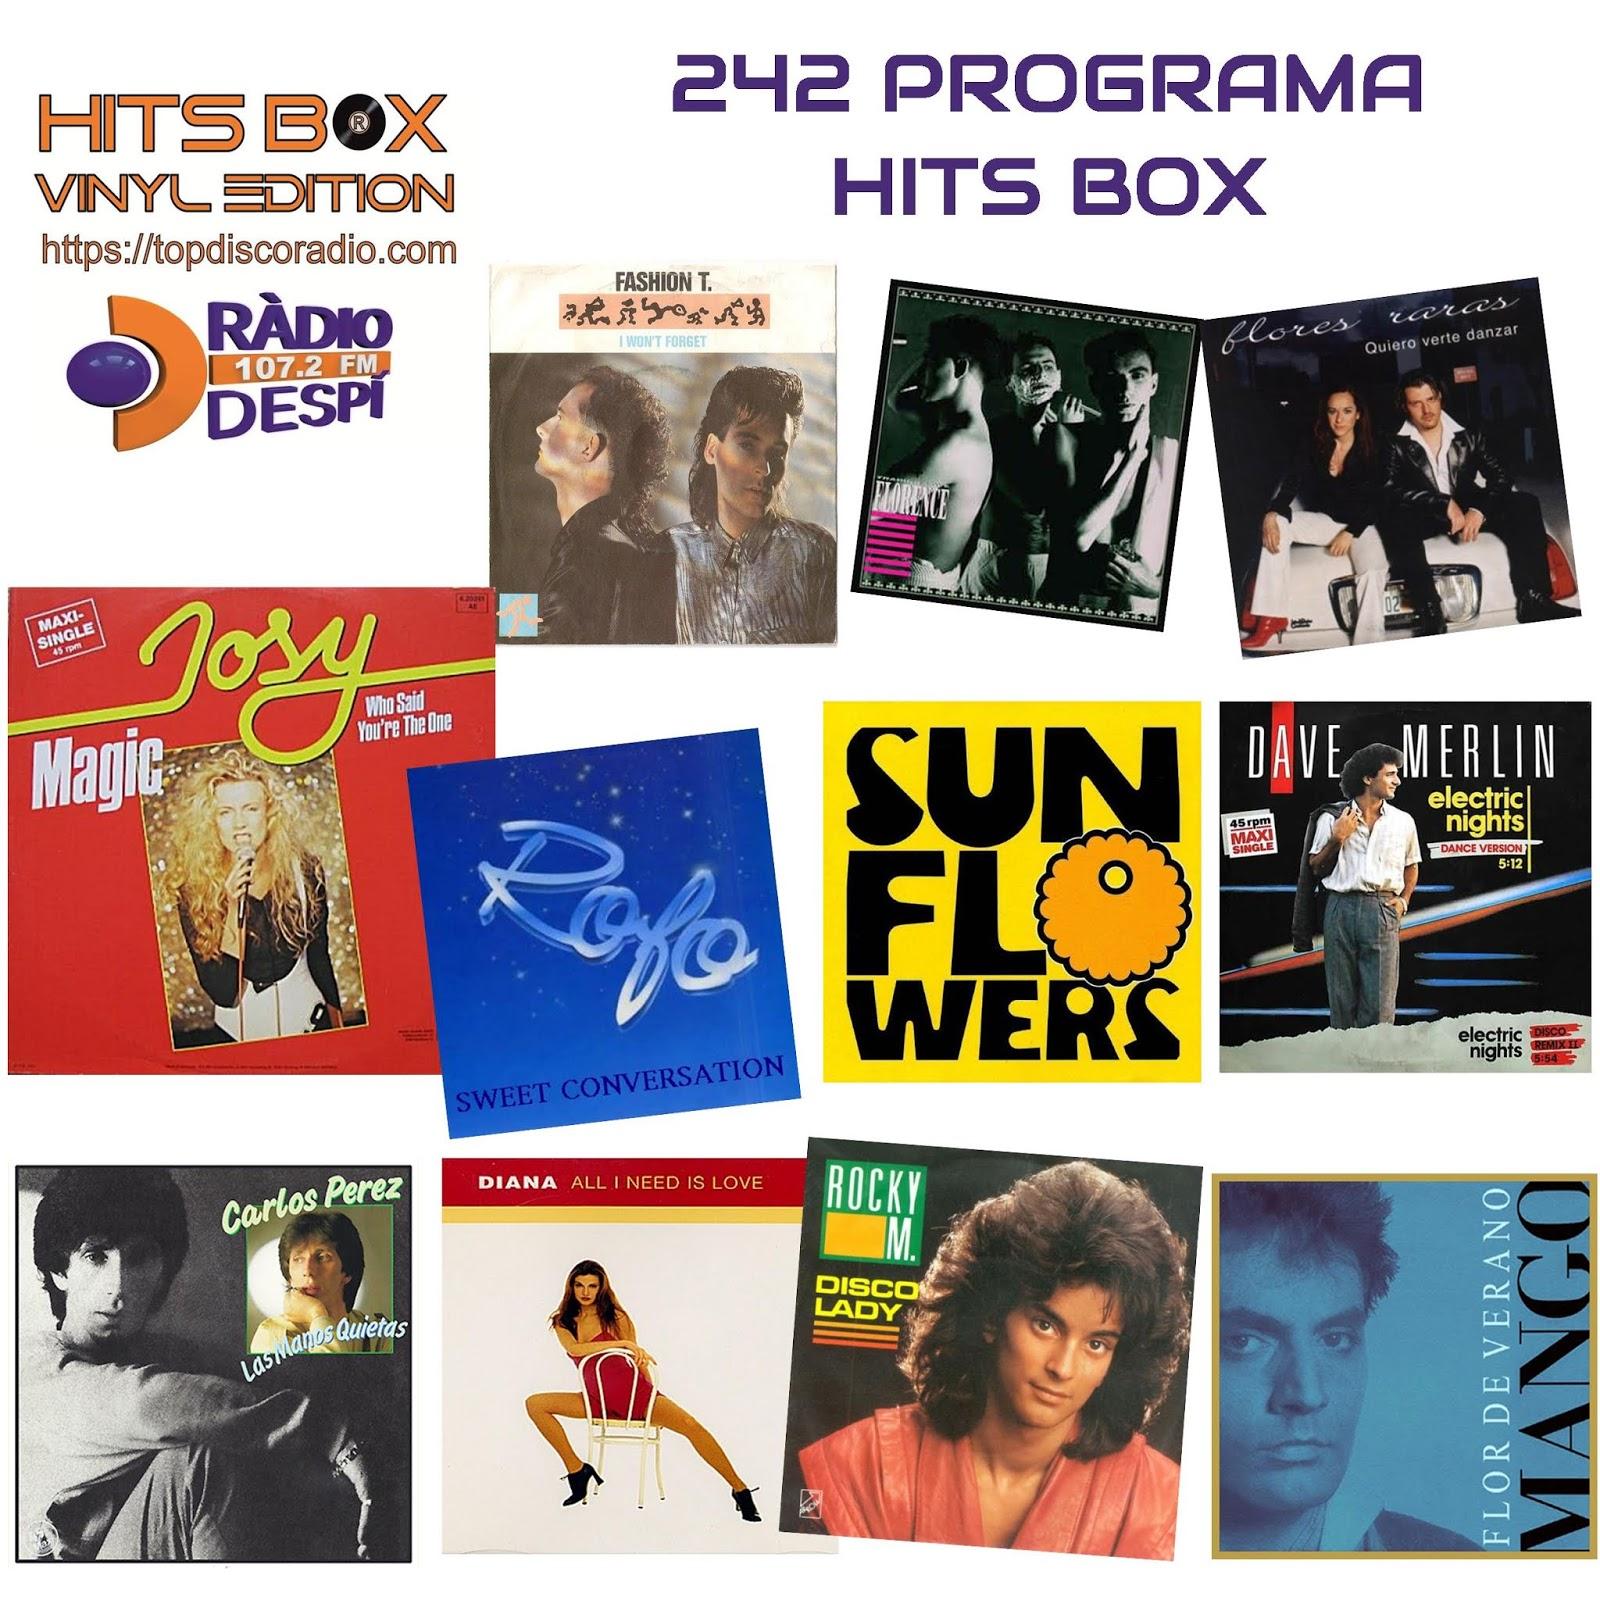 242 Programa Hits Box